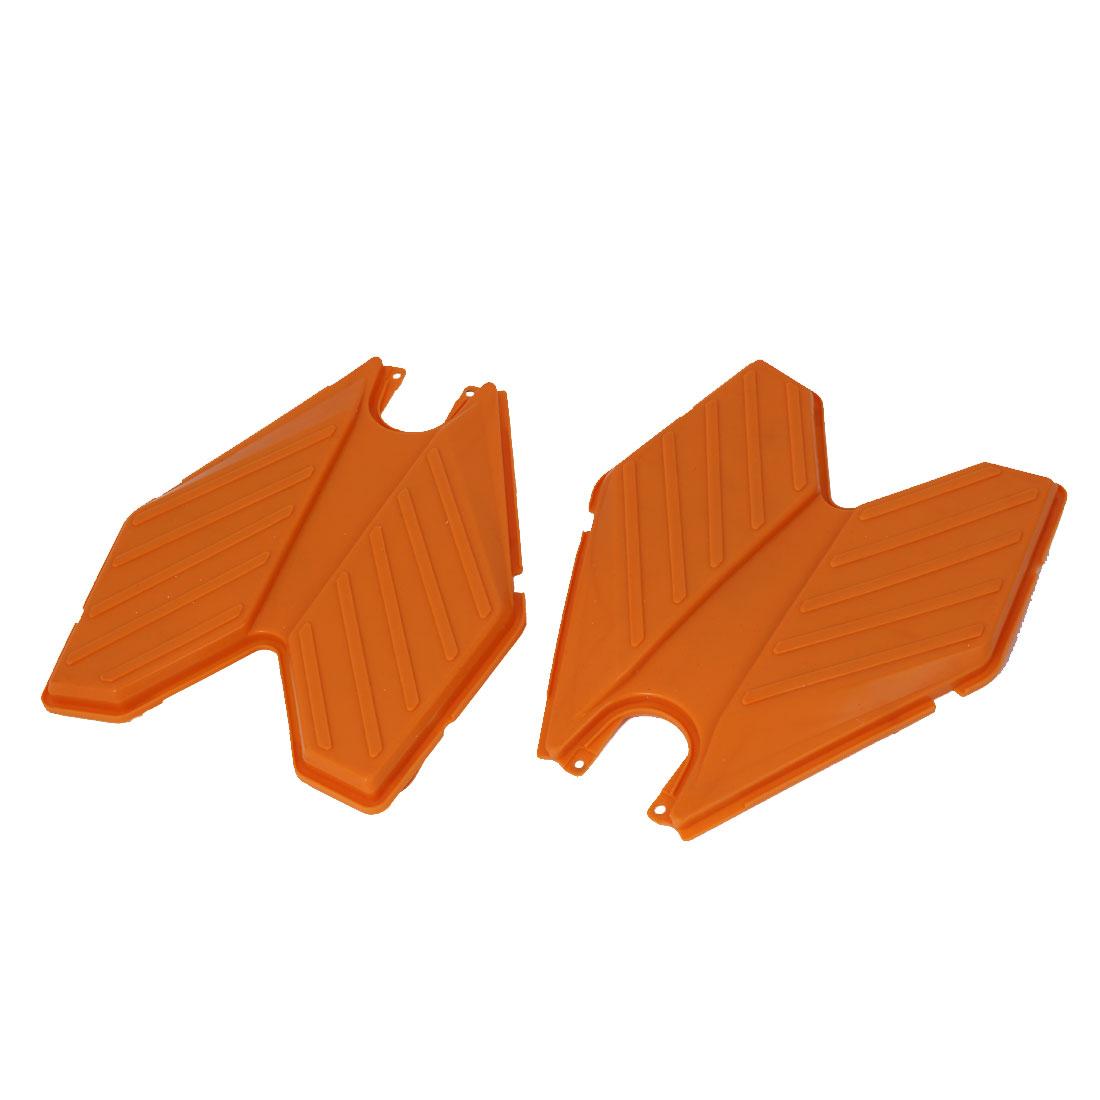 Swing Plasma Car Silicon Transformers Design Pedals Orange 2pcs